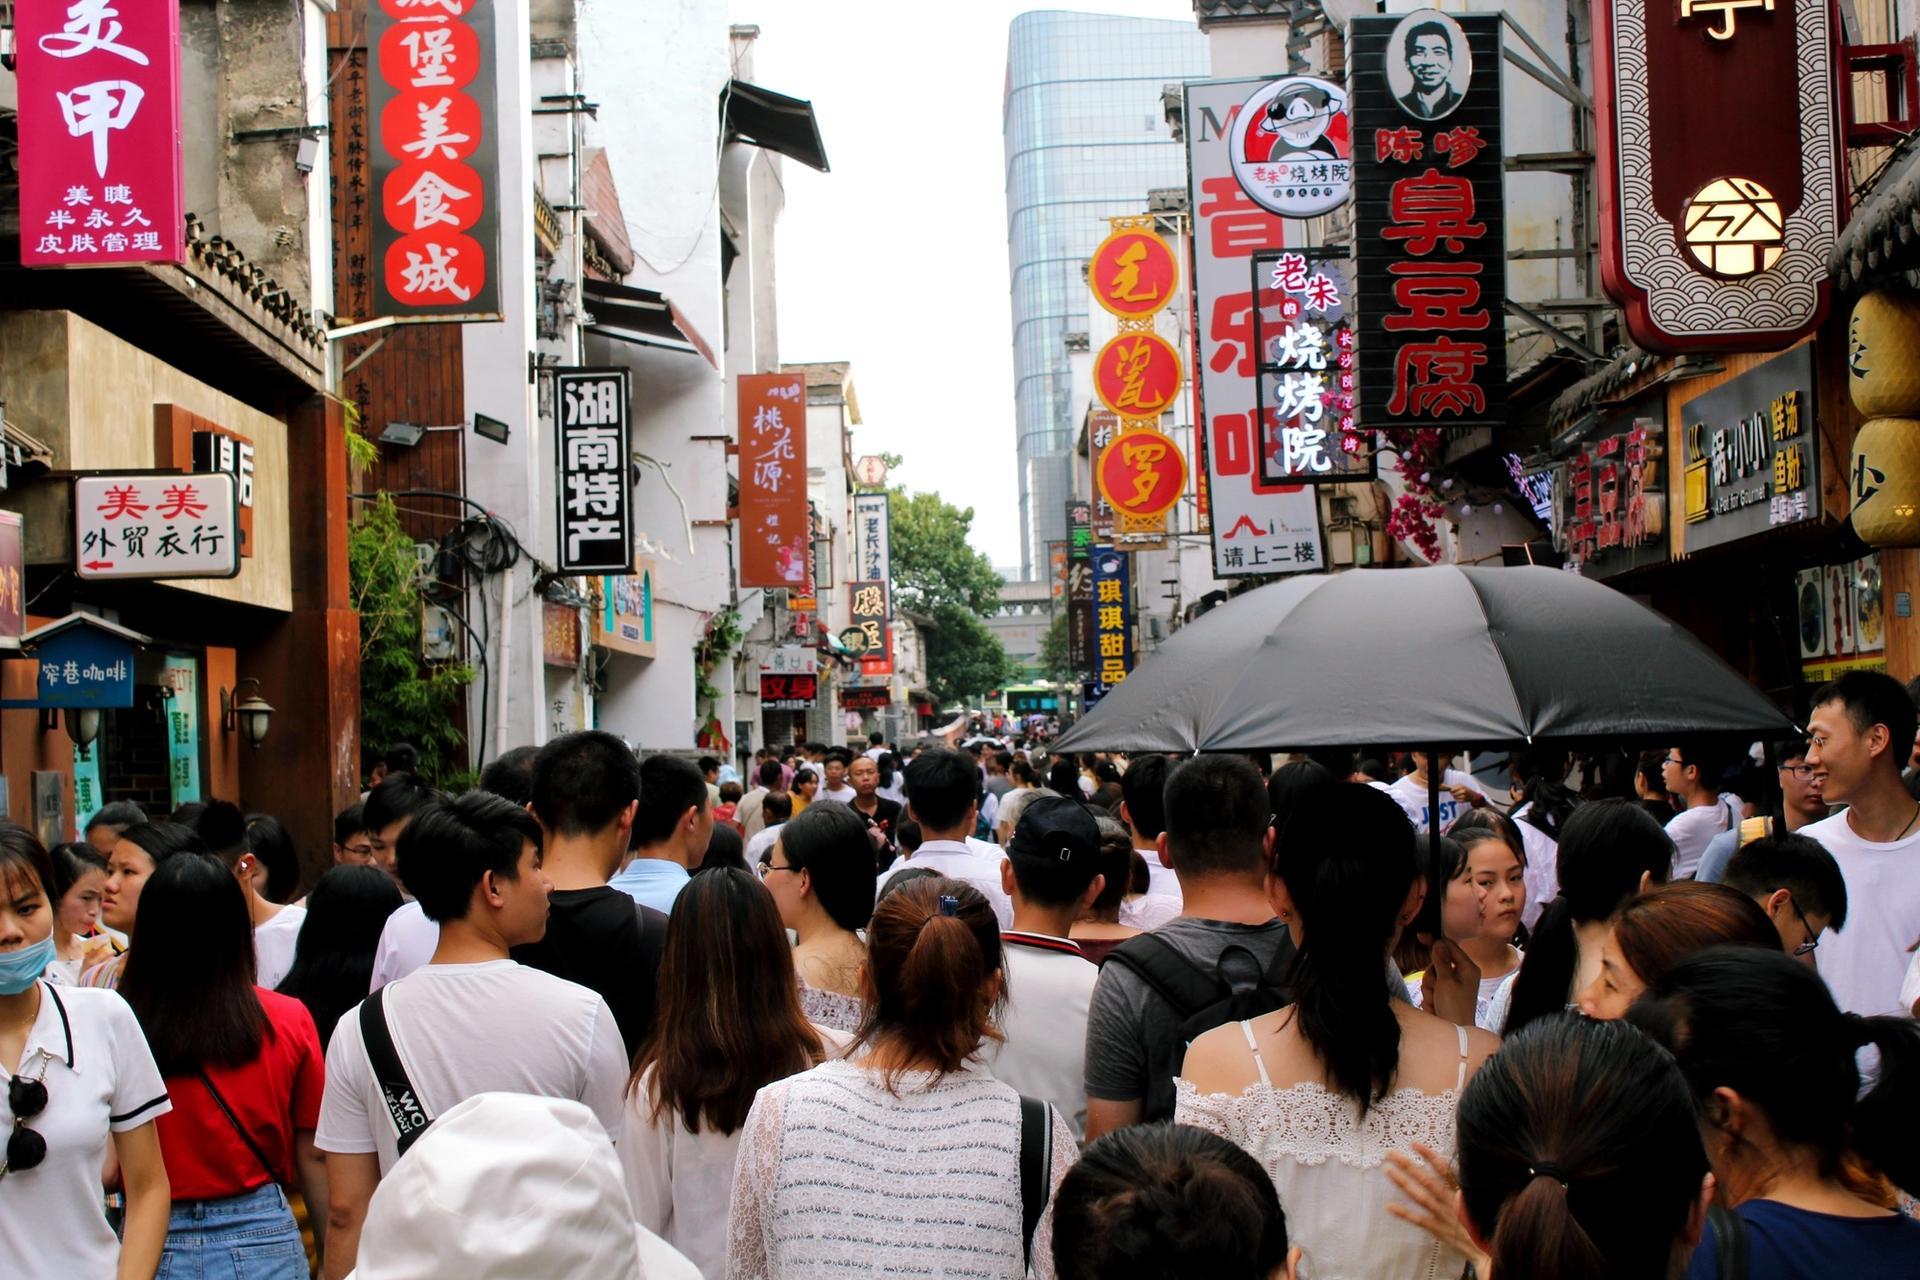 The Western art world has turned its back on China amidst the coronavirus crisis Photo: Jeddy Genrwot Gerald